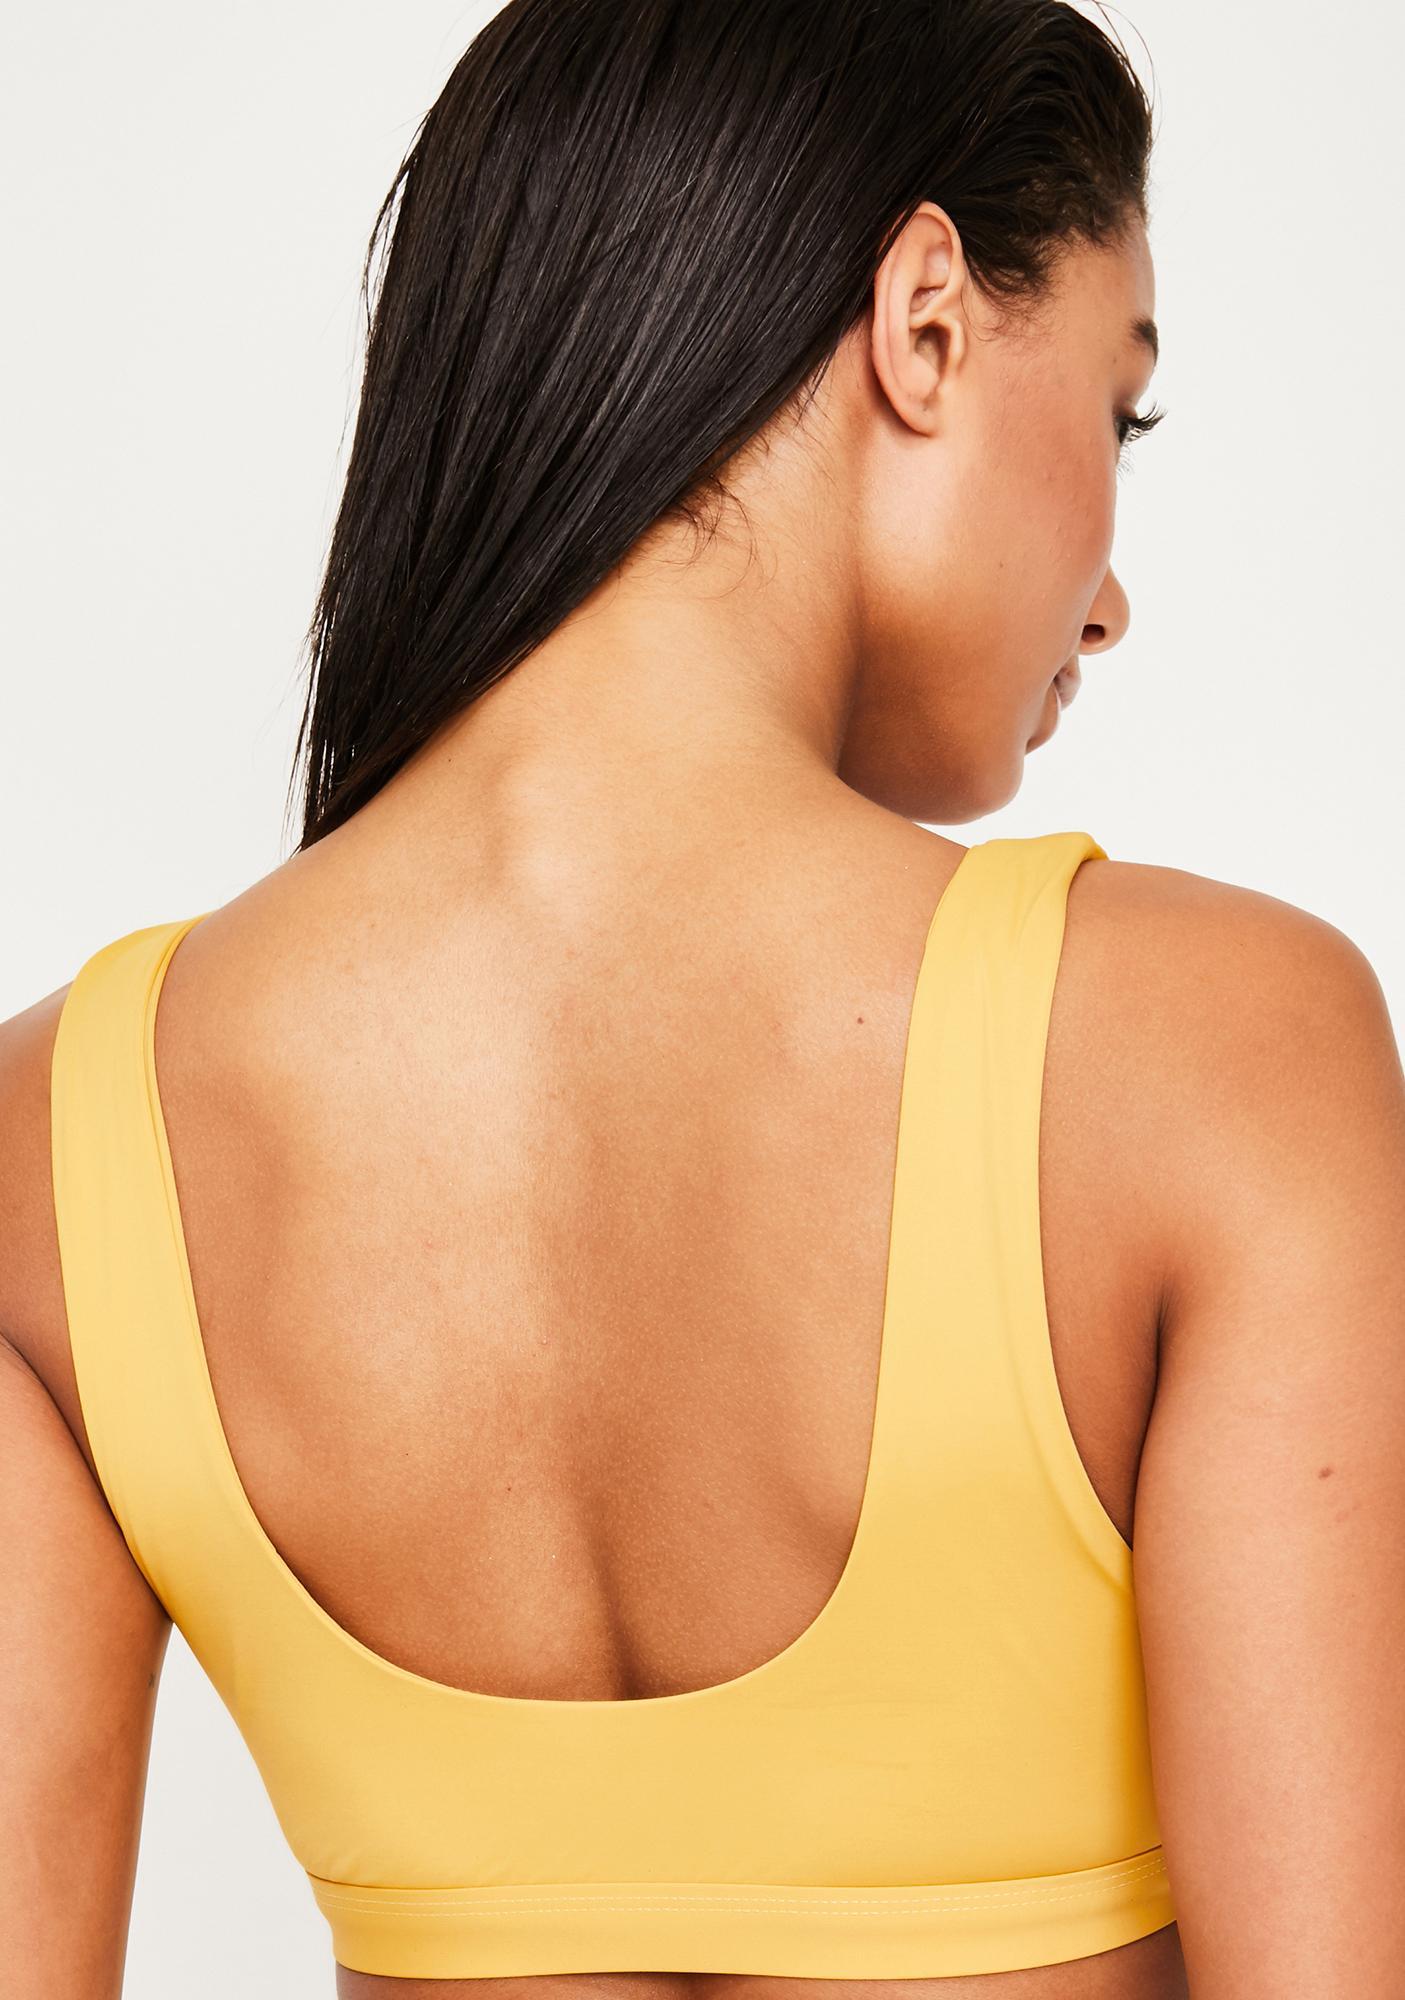 Dippin' Daisy's Honey Seamless Sports Bra Bikini Top